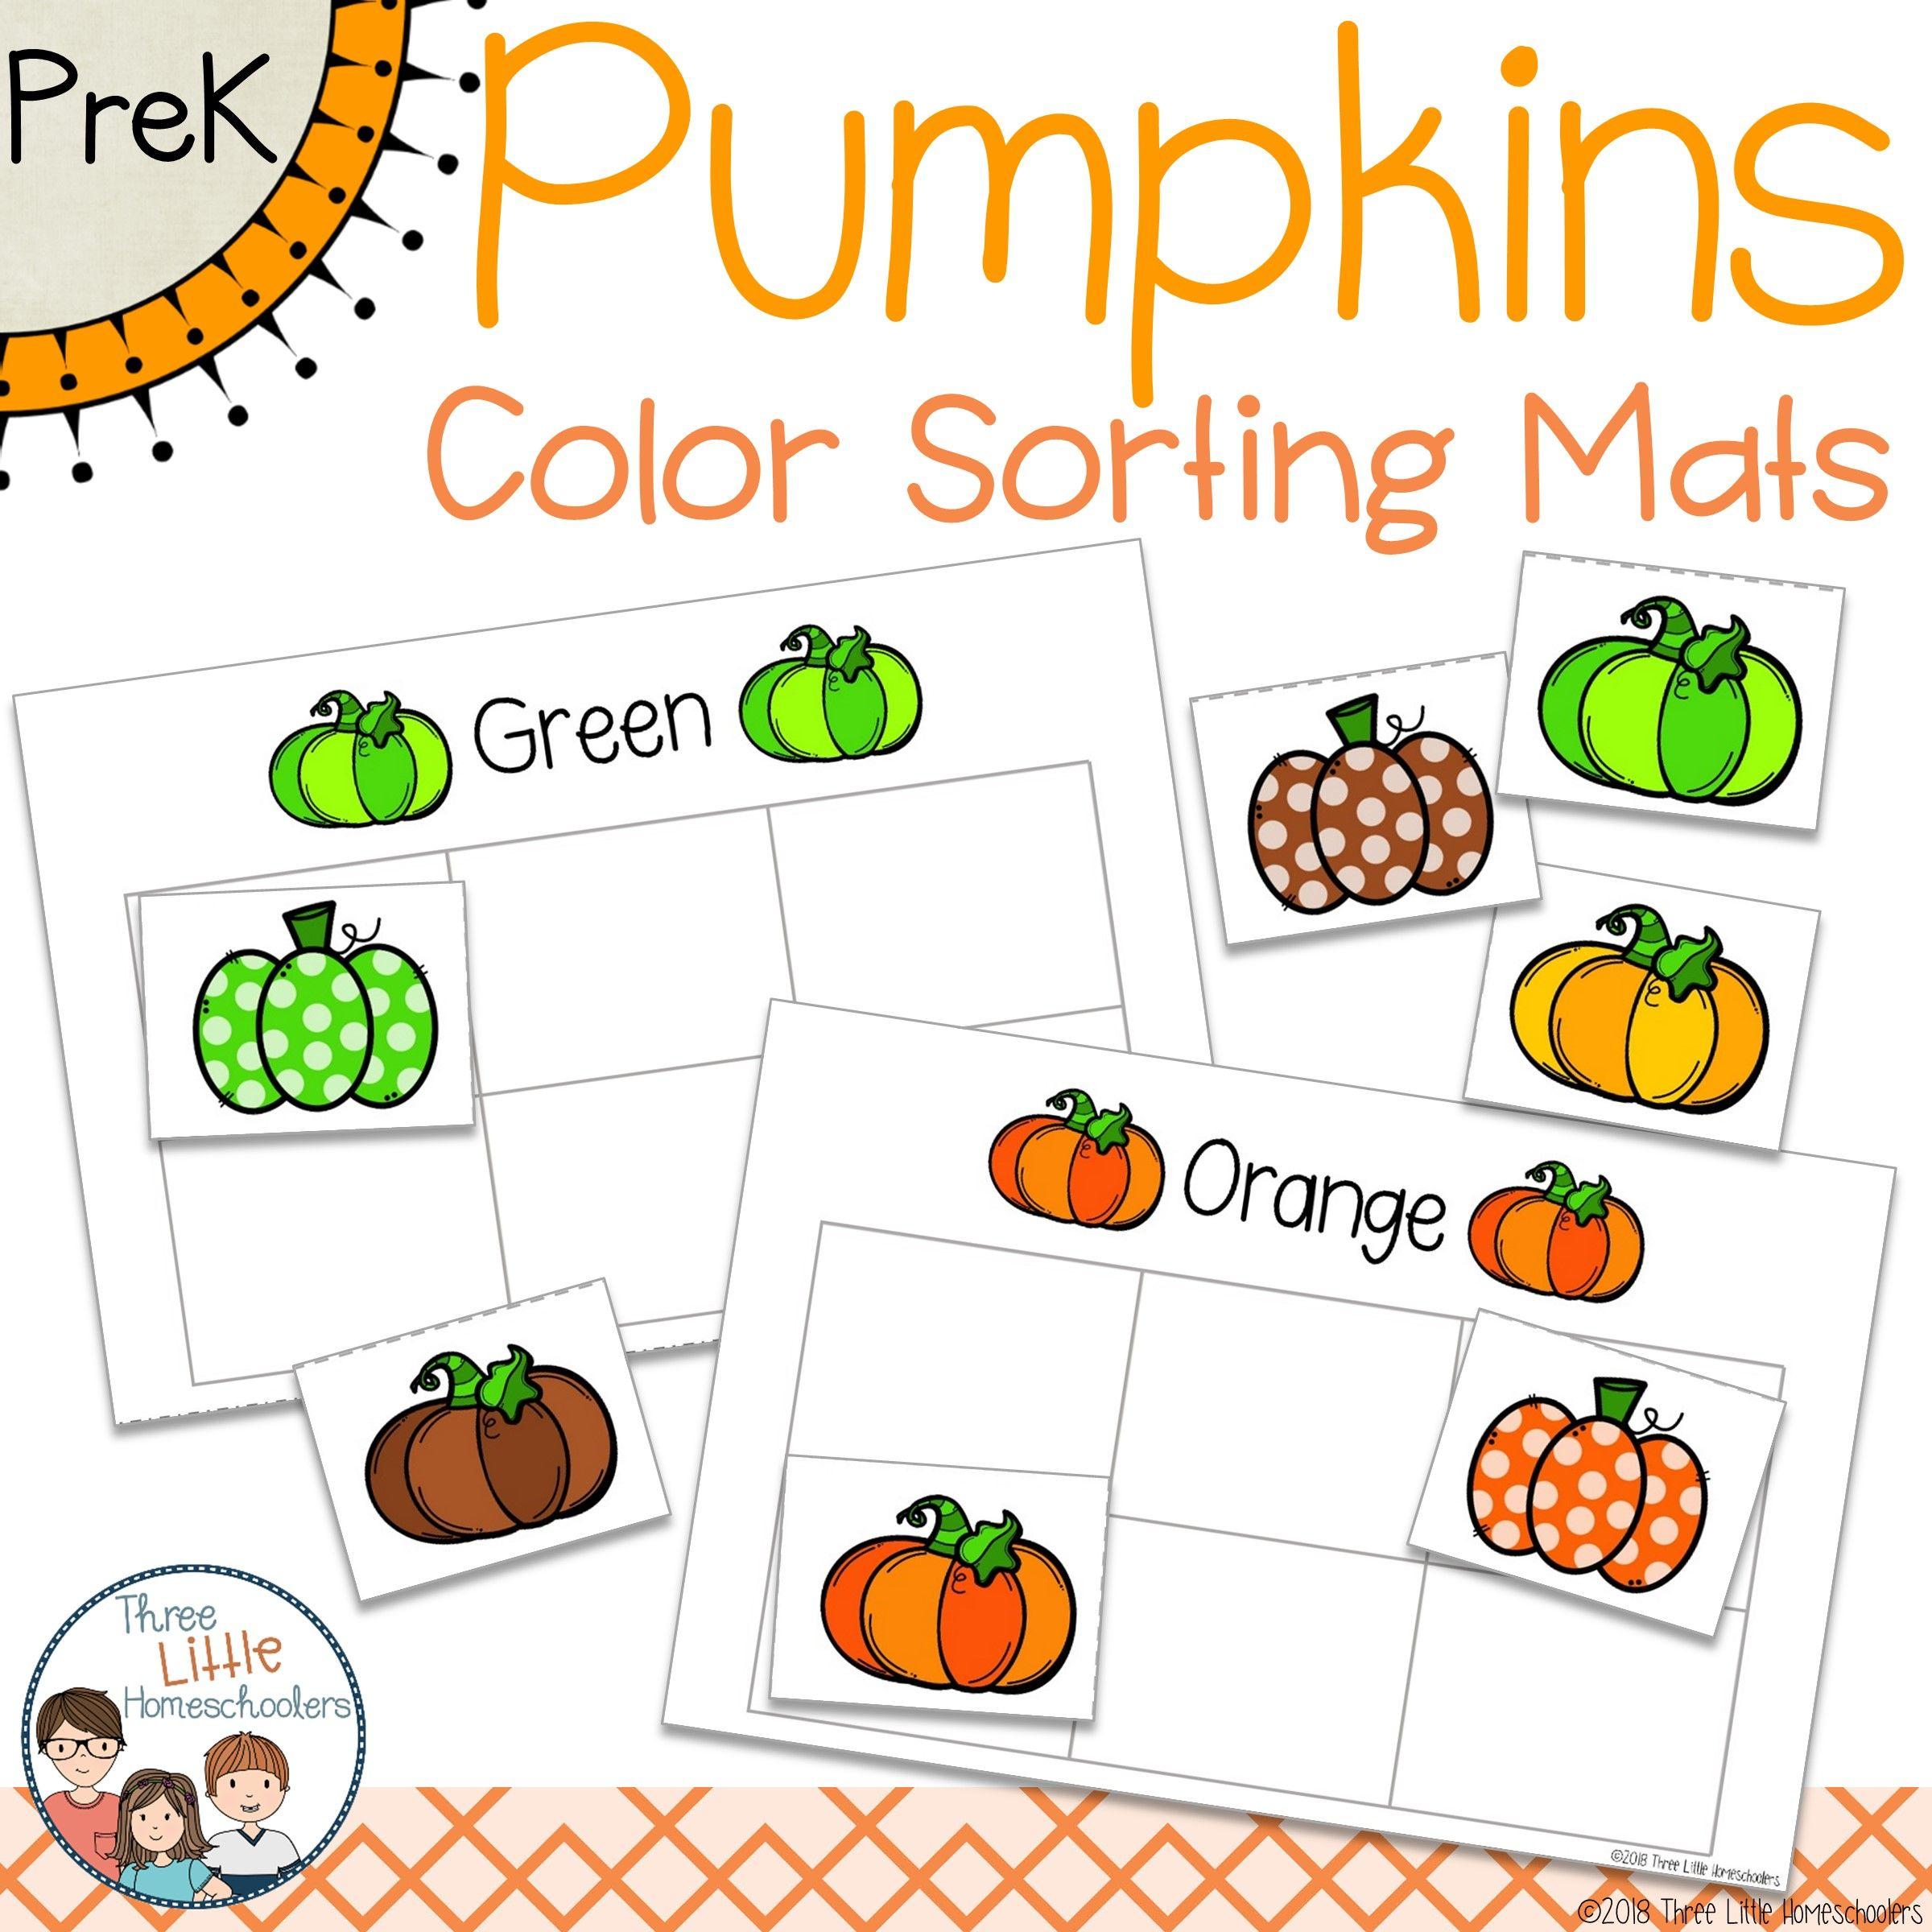 Pumpkins Color Sorting Mats And Worksheets